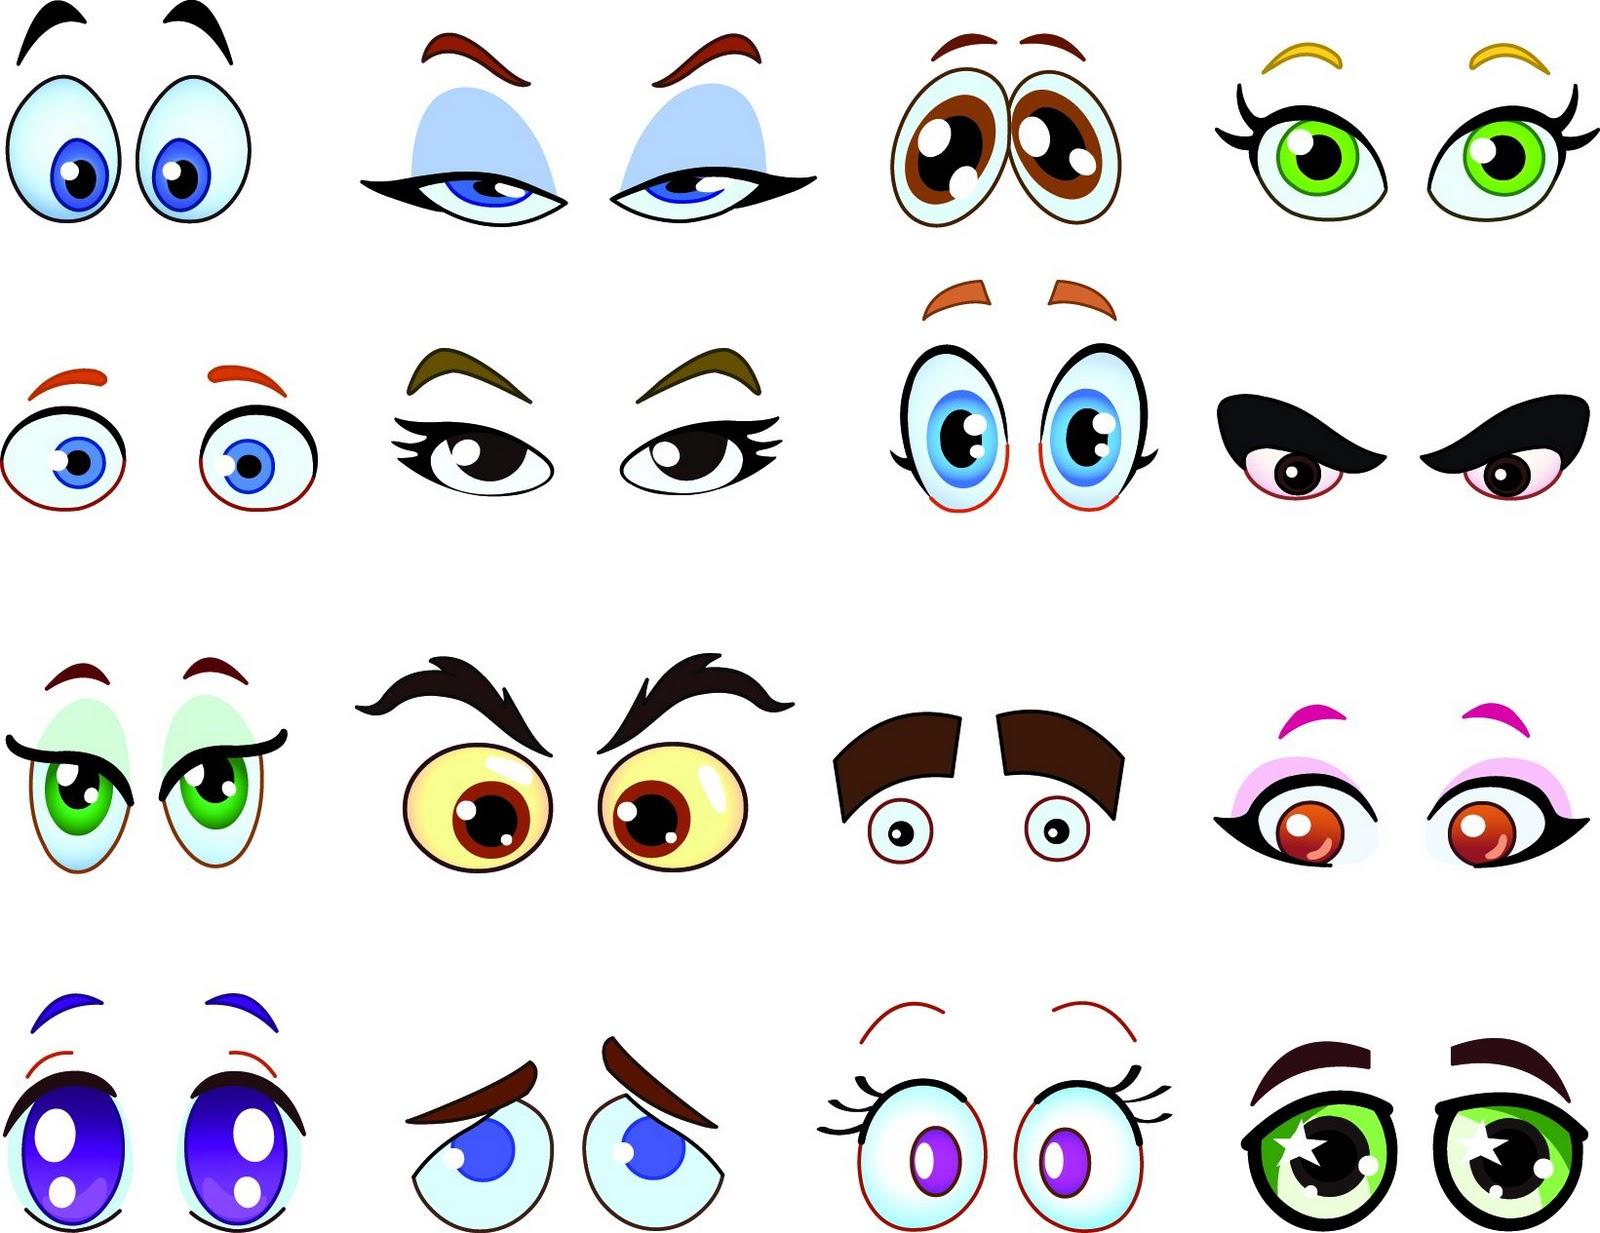 anime eyes clipart - photo #41